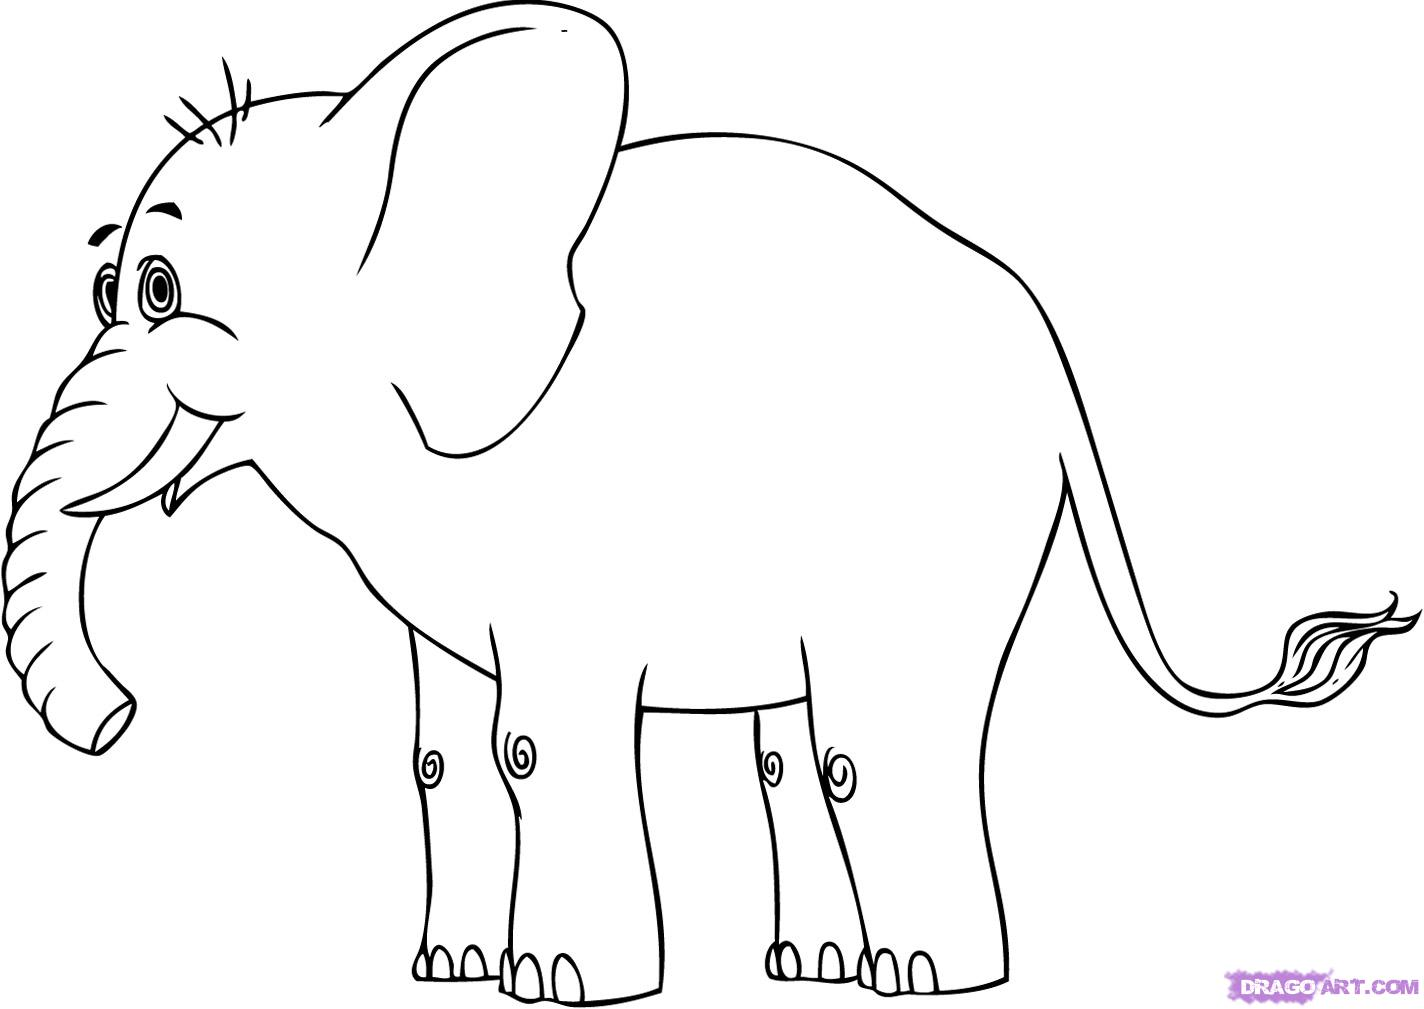 Drawn elephant To step Cartoon cartoon How